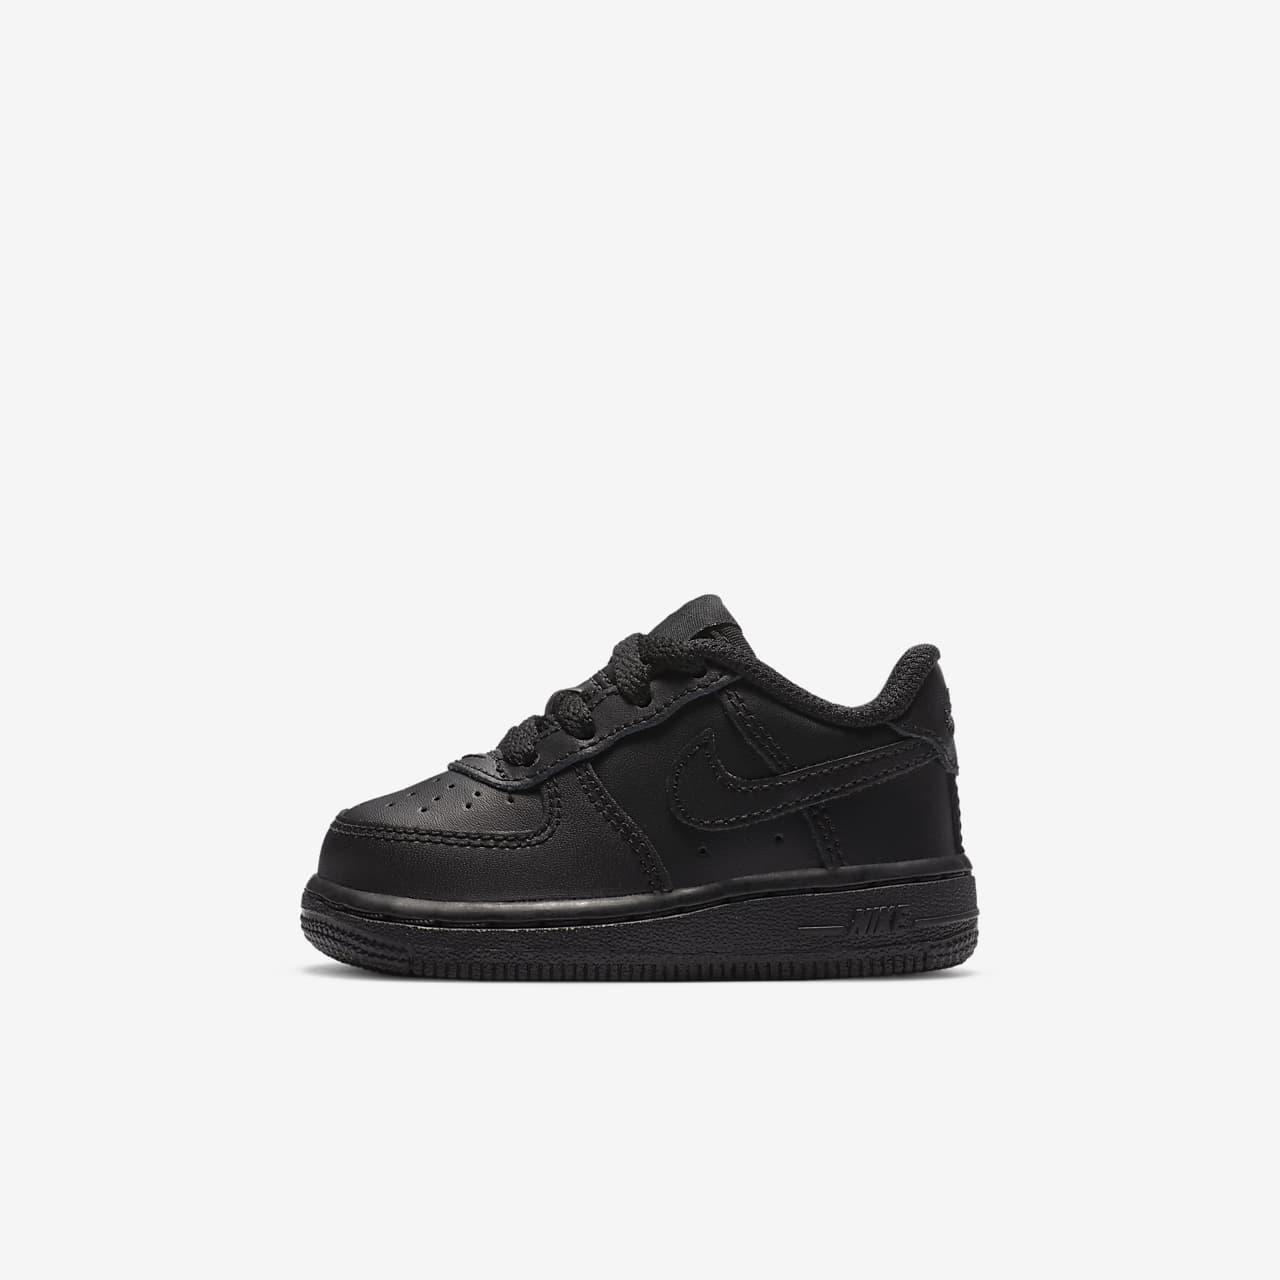 promo code 01a18 814ed ... Nike Air Force 1 06 Zapatillas - Bebés